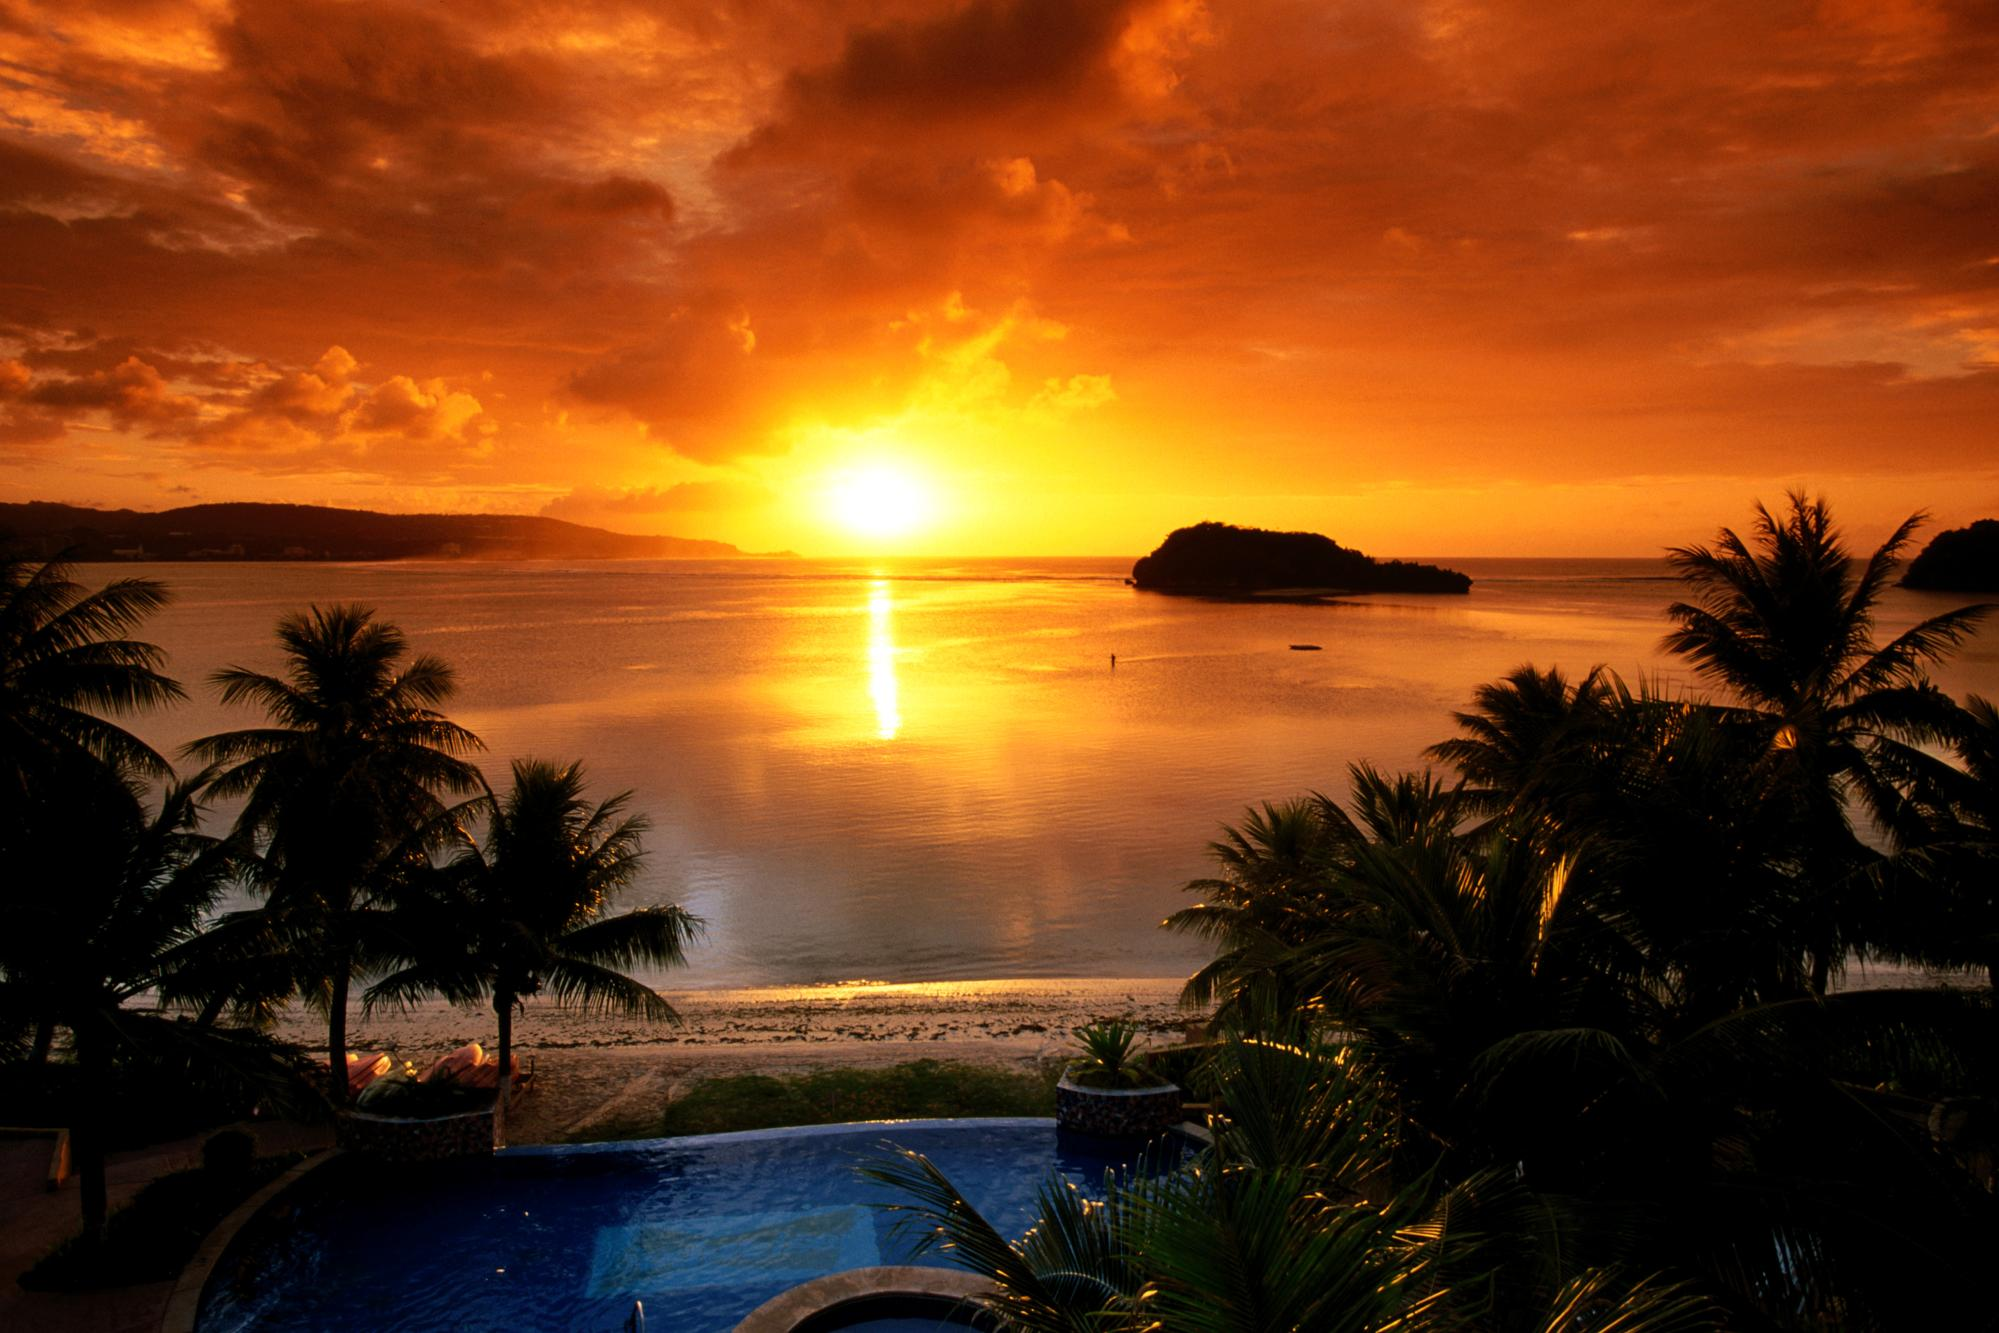 Agana Bay at Sunset, Tamuning, Guam